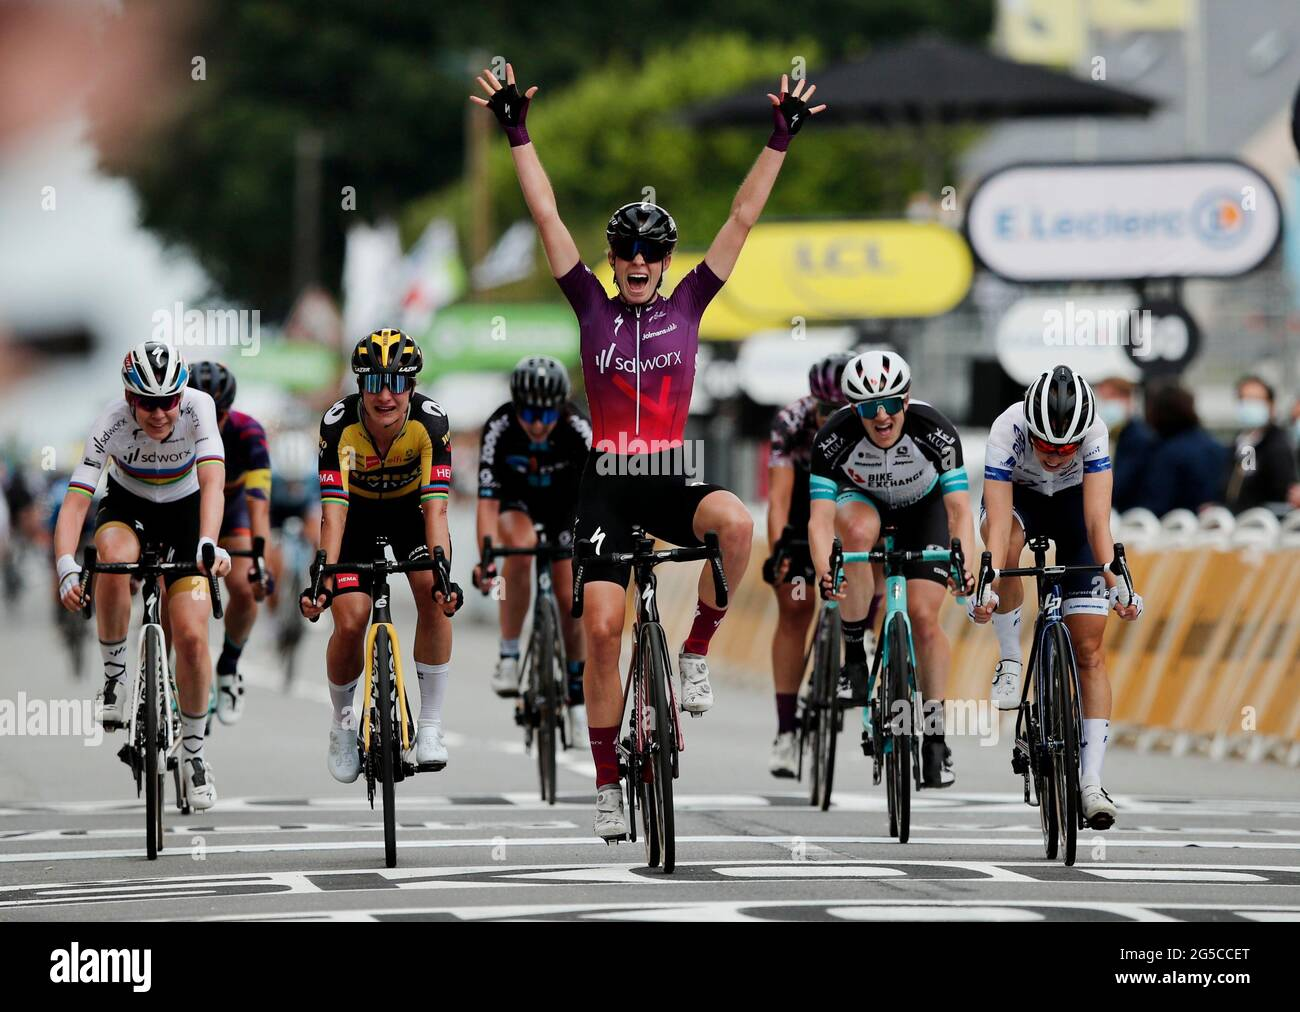 Cycling - La Course by Tour de France - Brest to Landerneau - Frankreich - 26. Juni 2021 Demi Vollering, ein Team von SD Worx Women Cycling Team, feiert den Etappensieg über REUTERS/Benoit Tessier Stockfoto